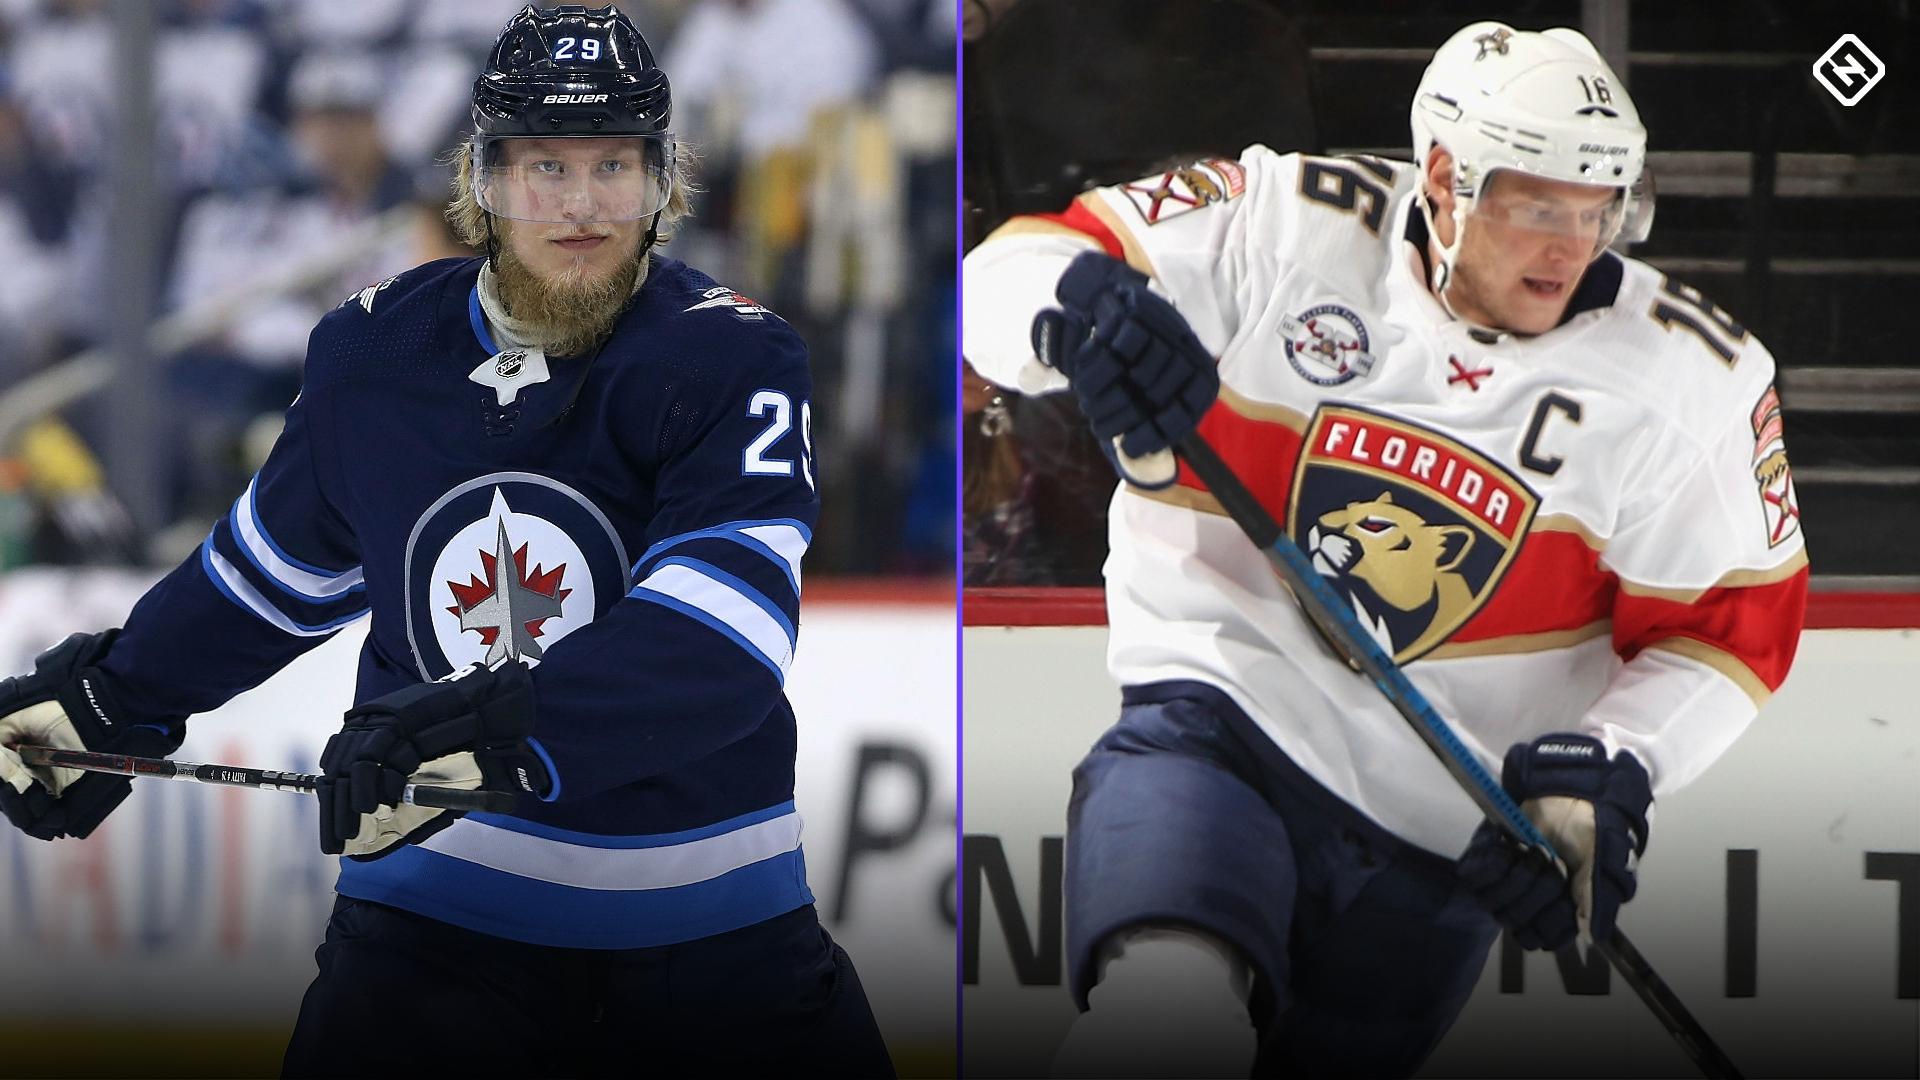 Patrik Laine, Aleksander Barkov look to inspire, leading NHL teams in Finland visit